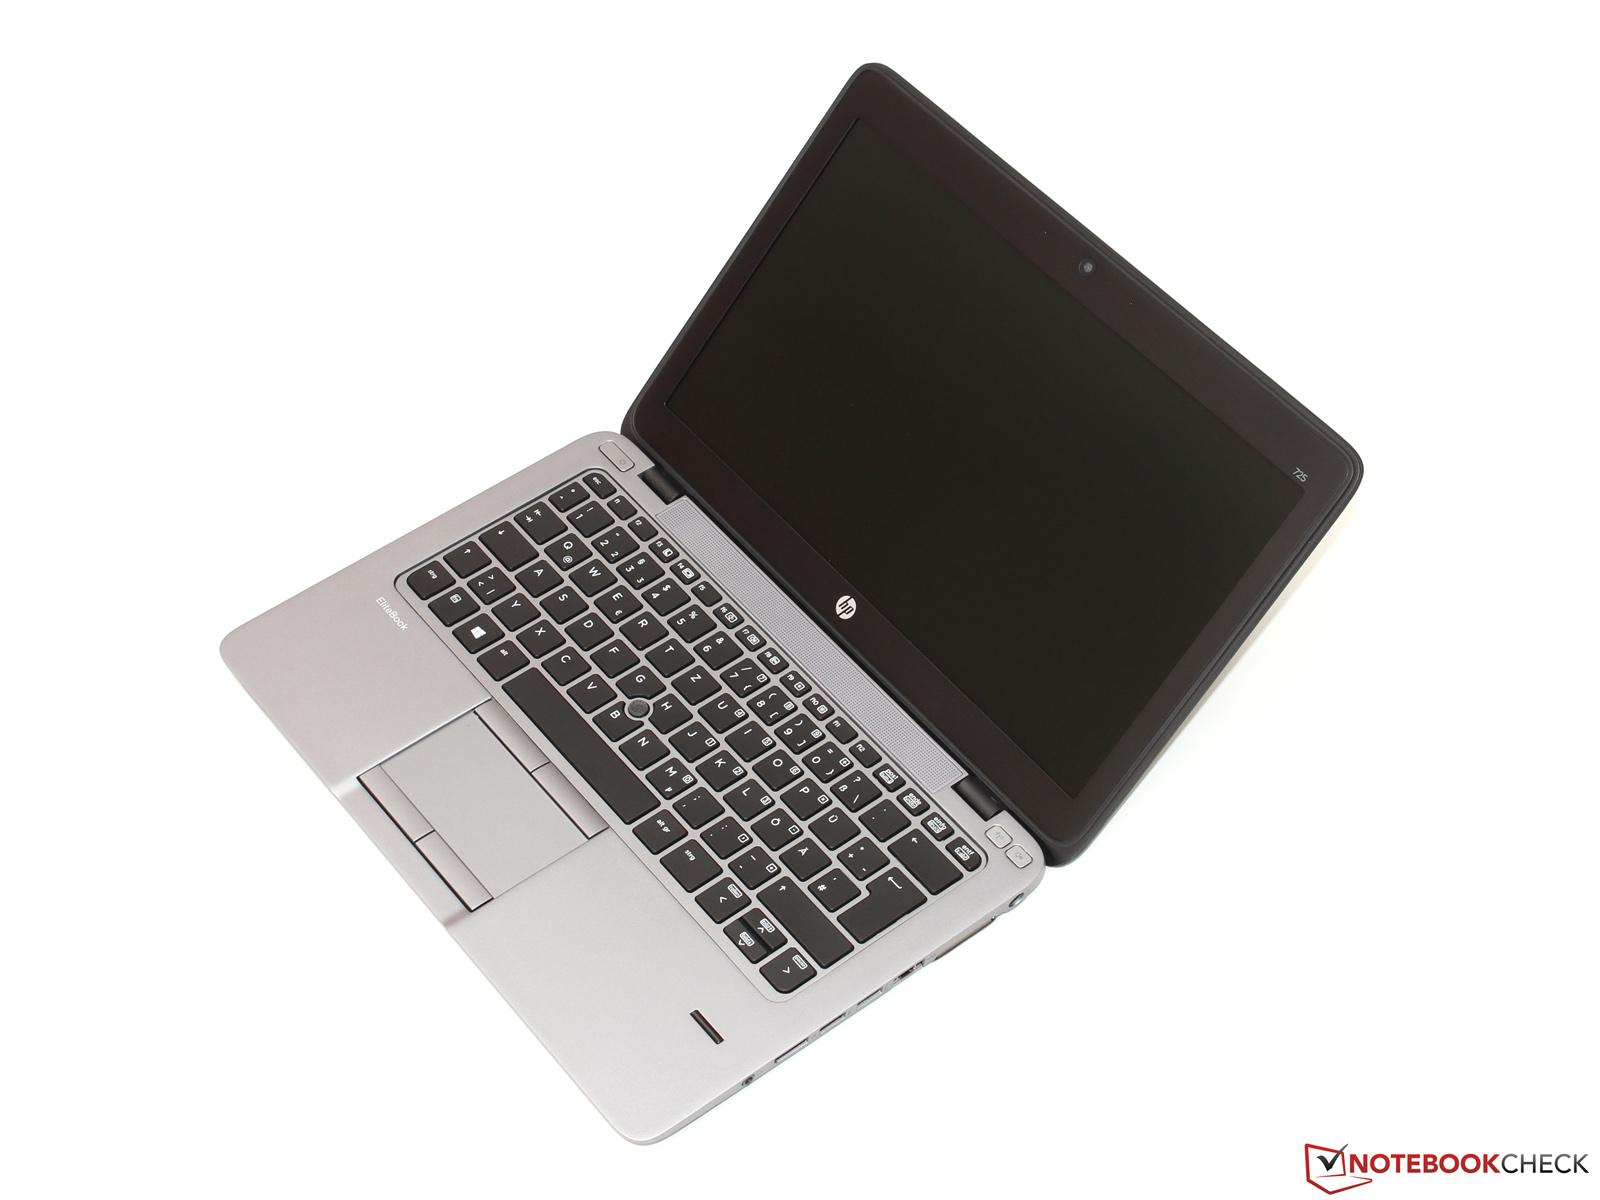 Recensione Breve Del Portatile Hp Elitebook 725 G2 J0h65aw Notebookcheck It